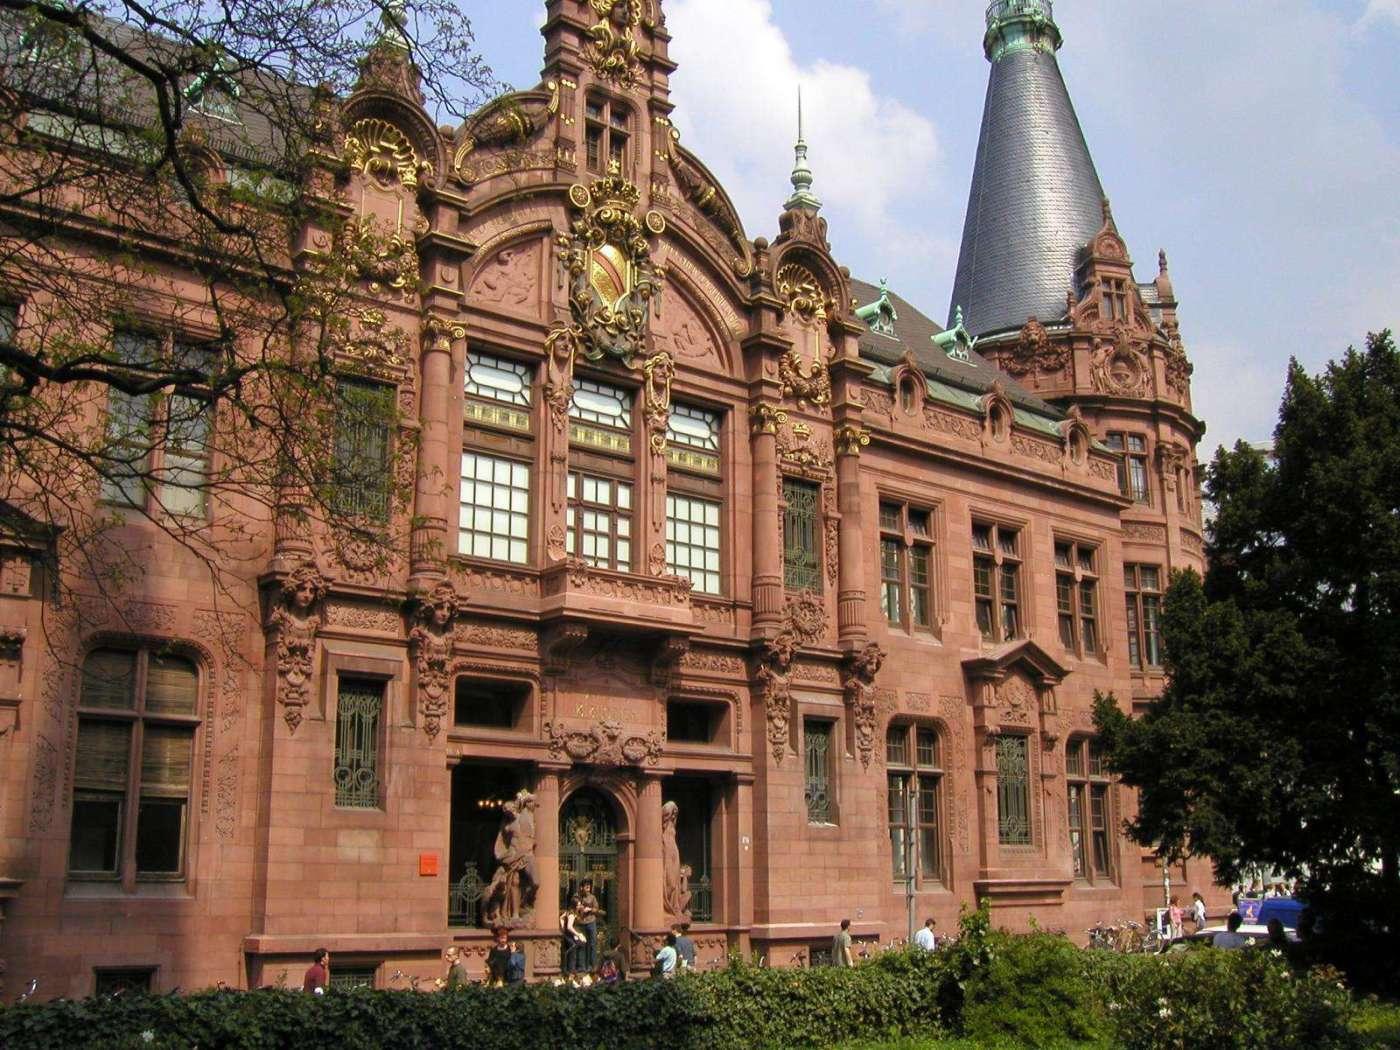 Ruprecht-Karls-Universit?t Heidelberg